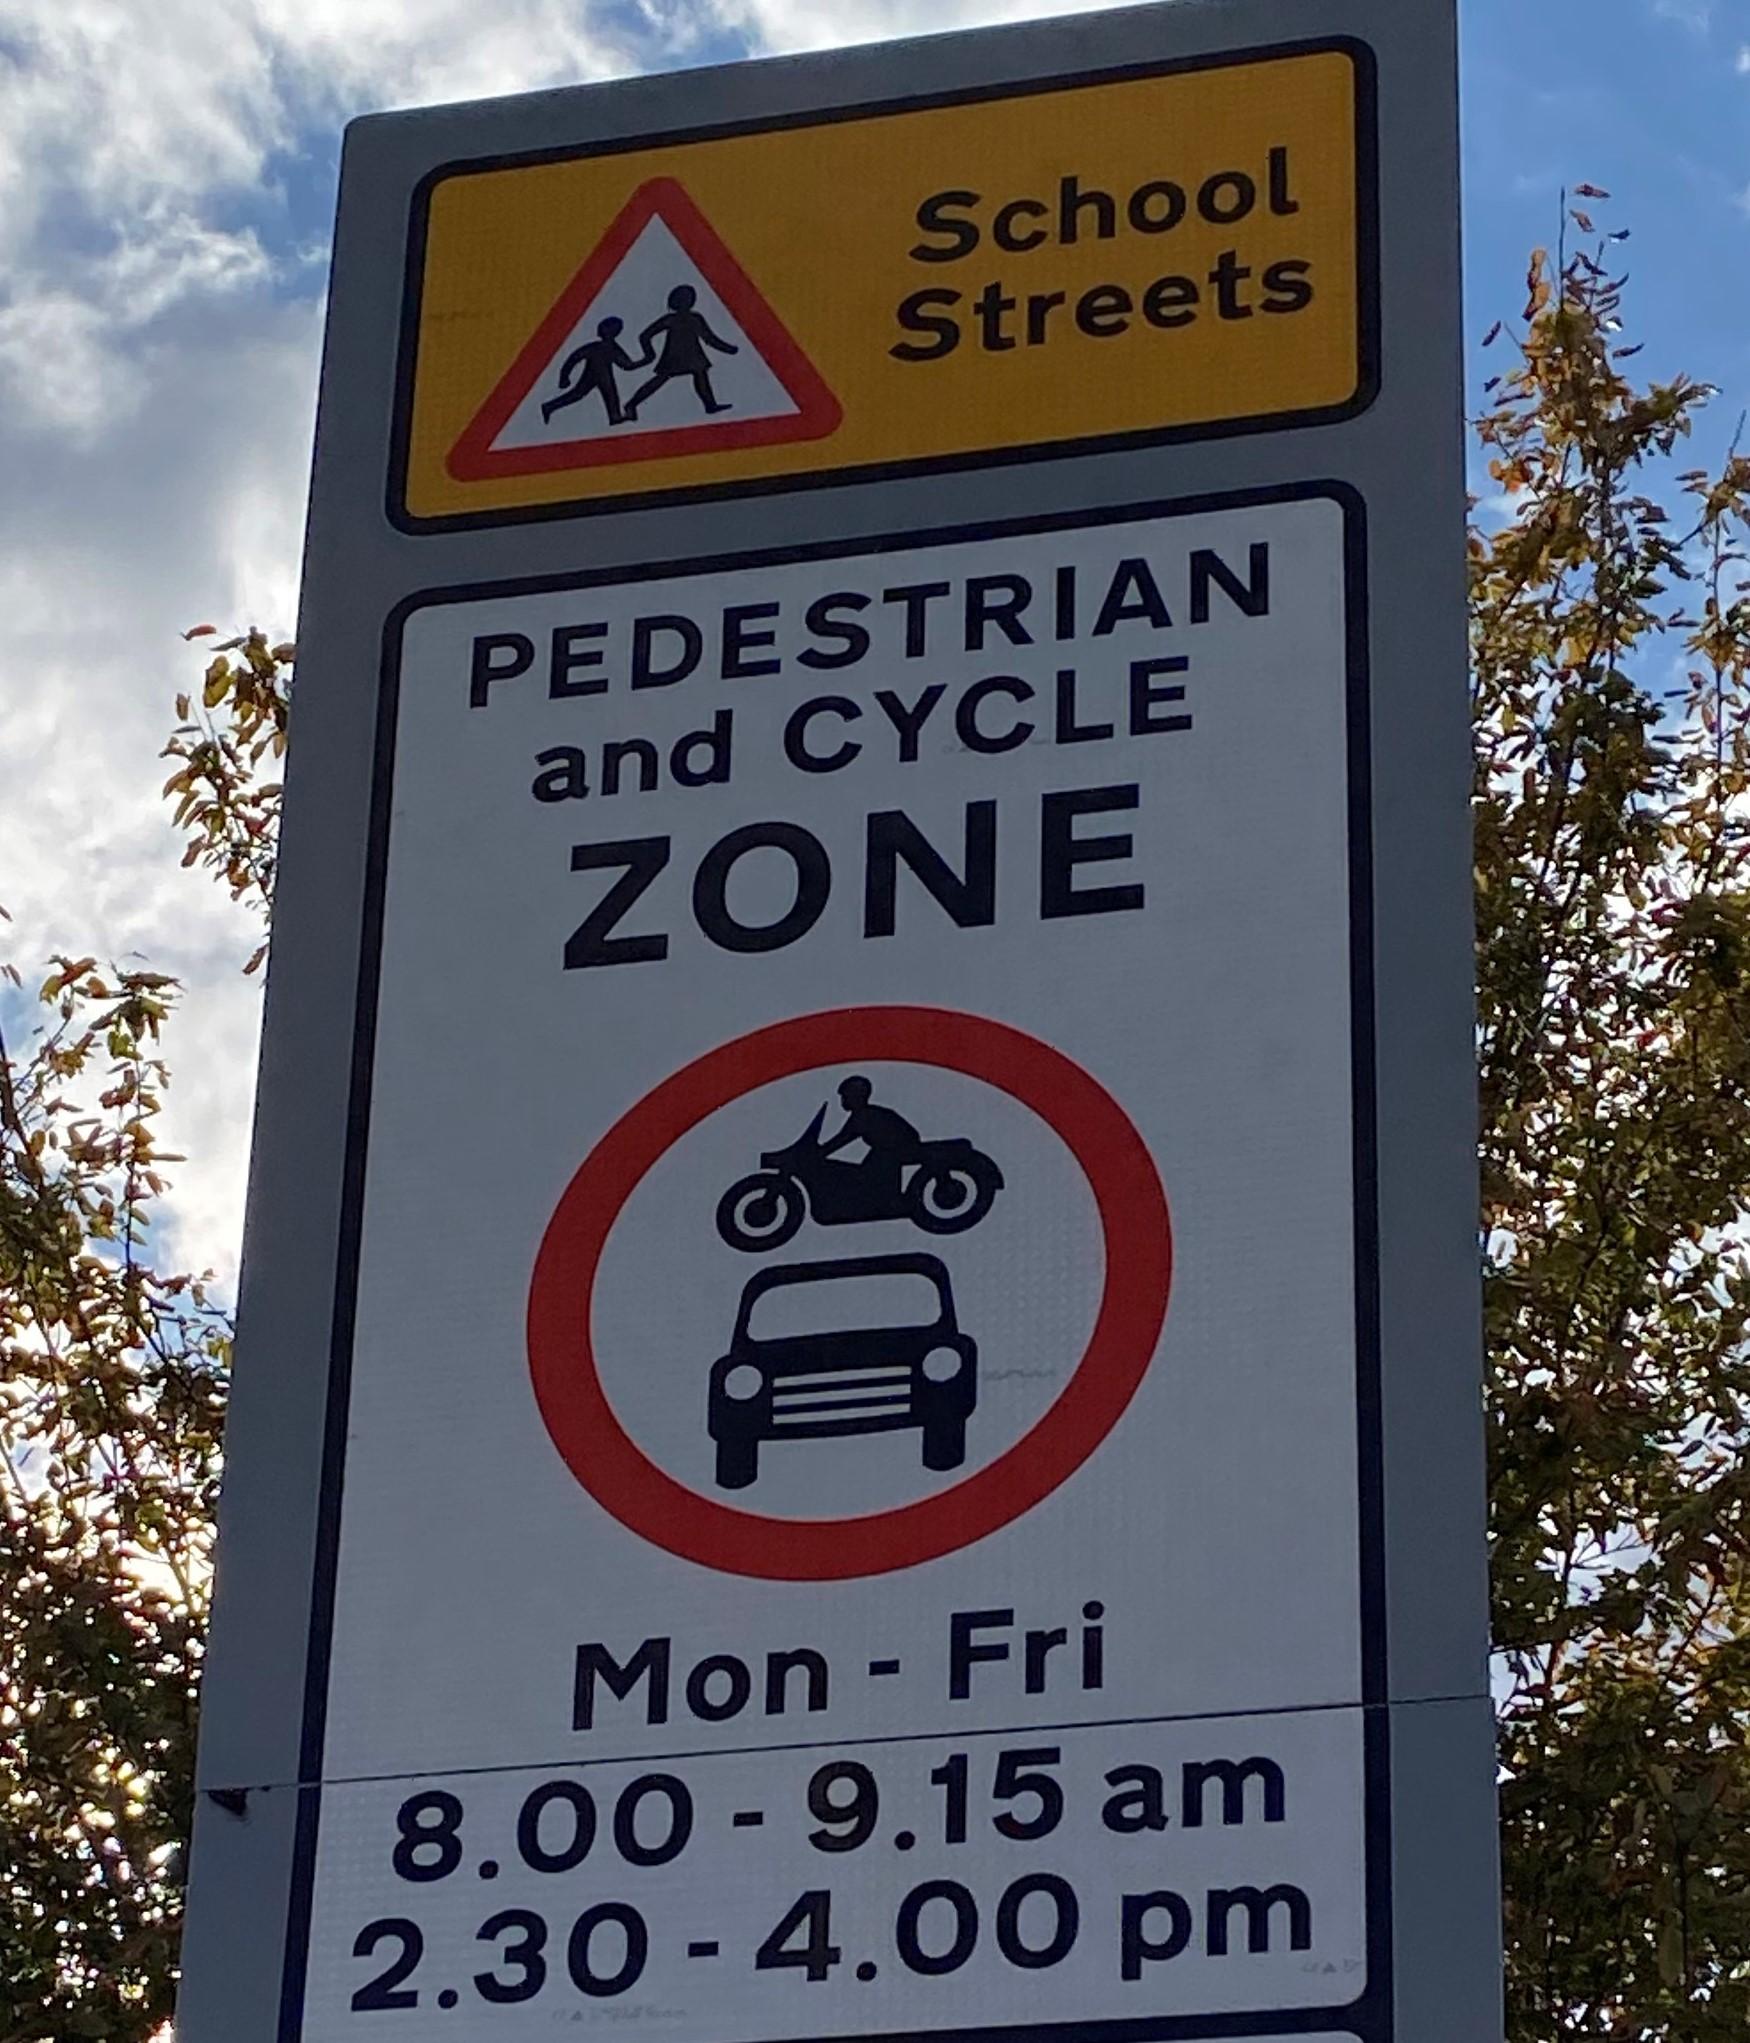 School Streets road sign   School Streets Initiative